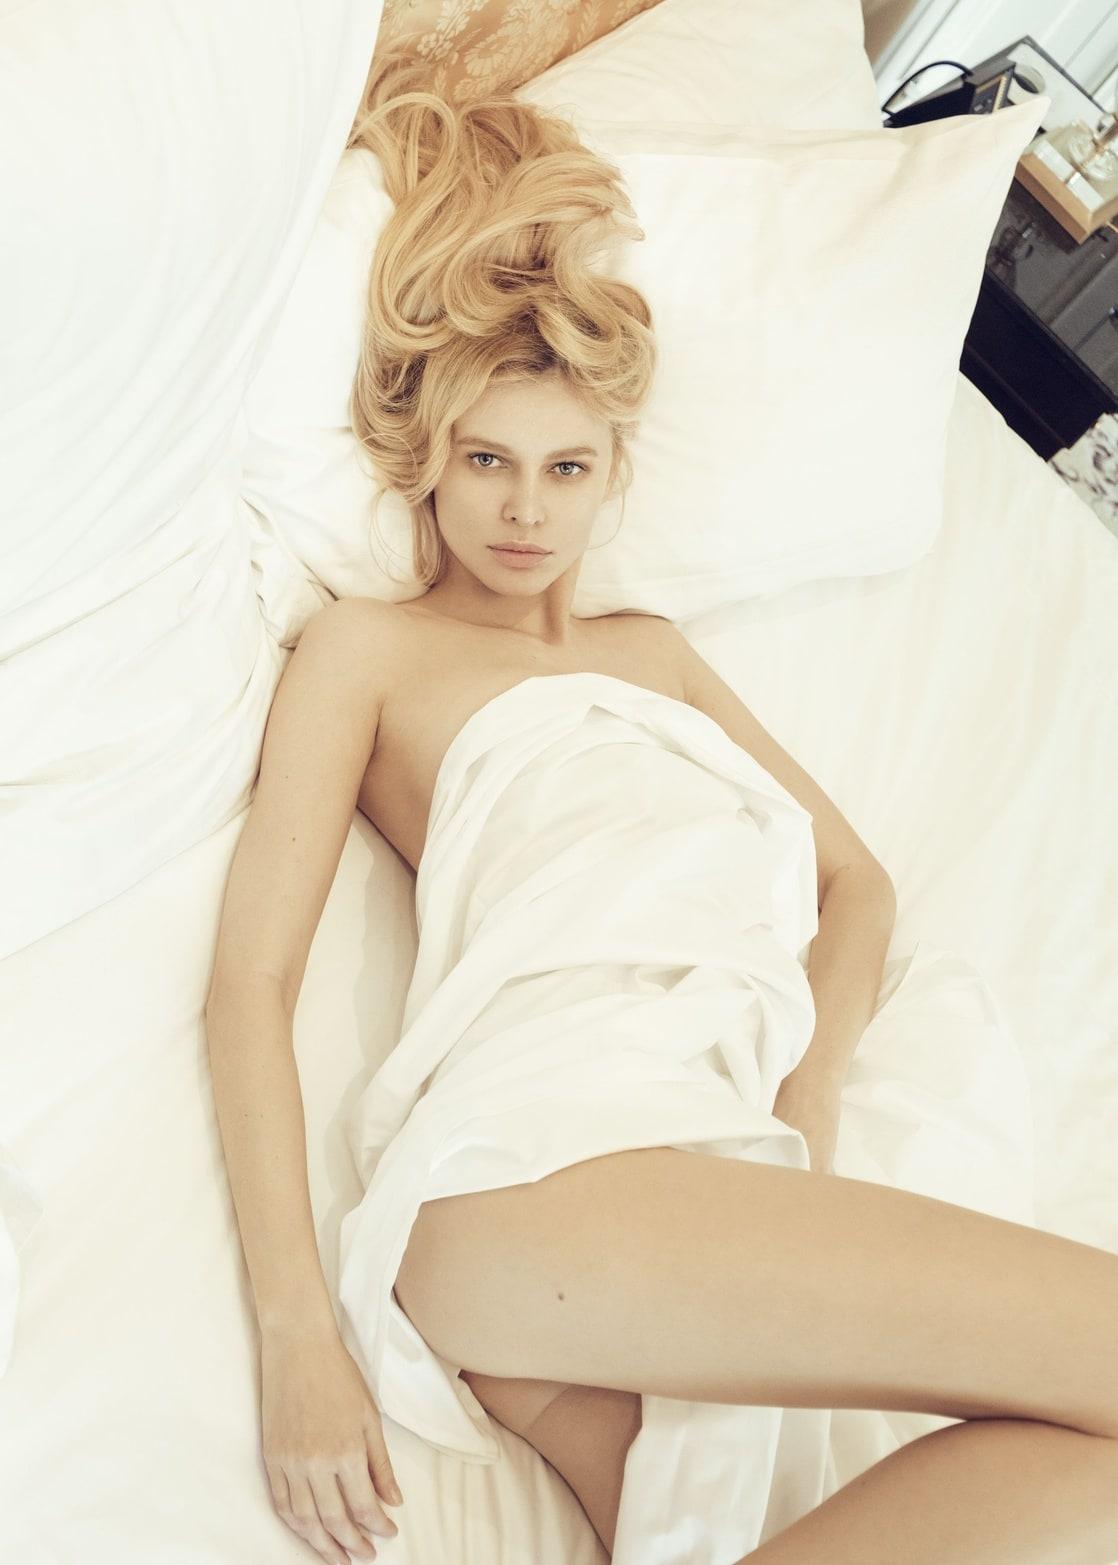 Fotos Alicja Ruchala naked (29 photos), Pussy, Paparazzi, Feet, butt 2020